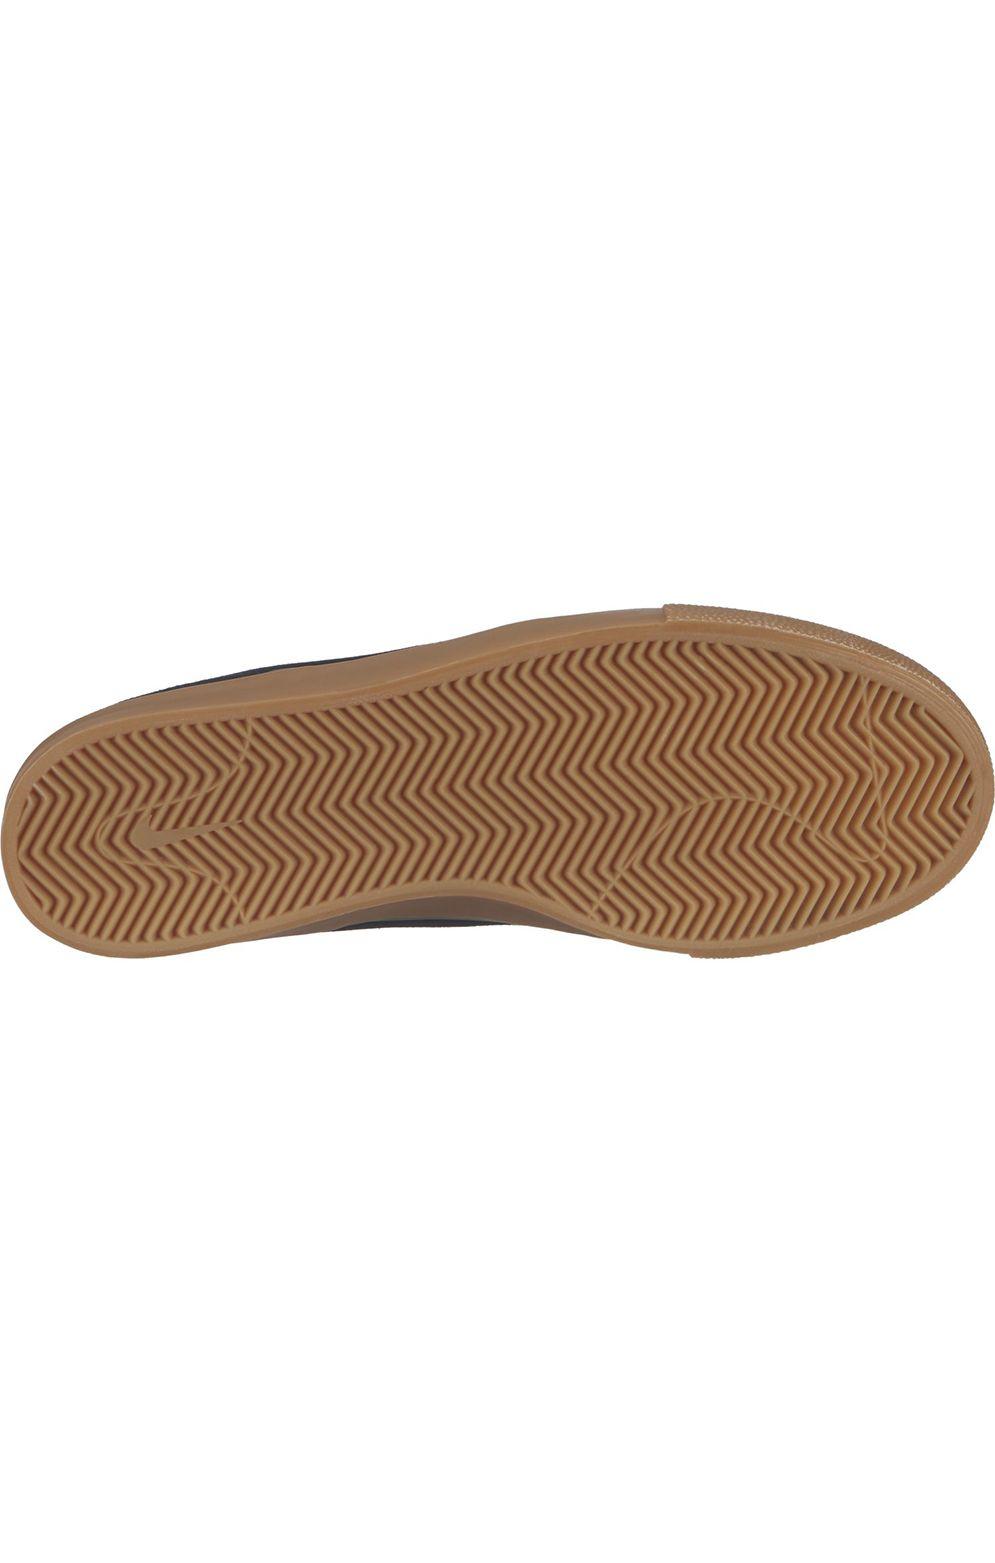 Tenis Nike Sb ZOOM STEFAN JANOSKI RM Black/White-Black-Gum Light Brown